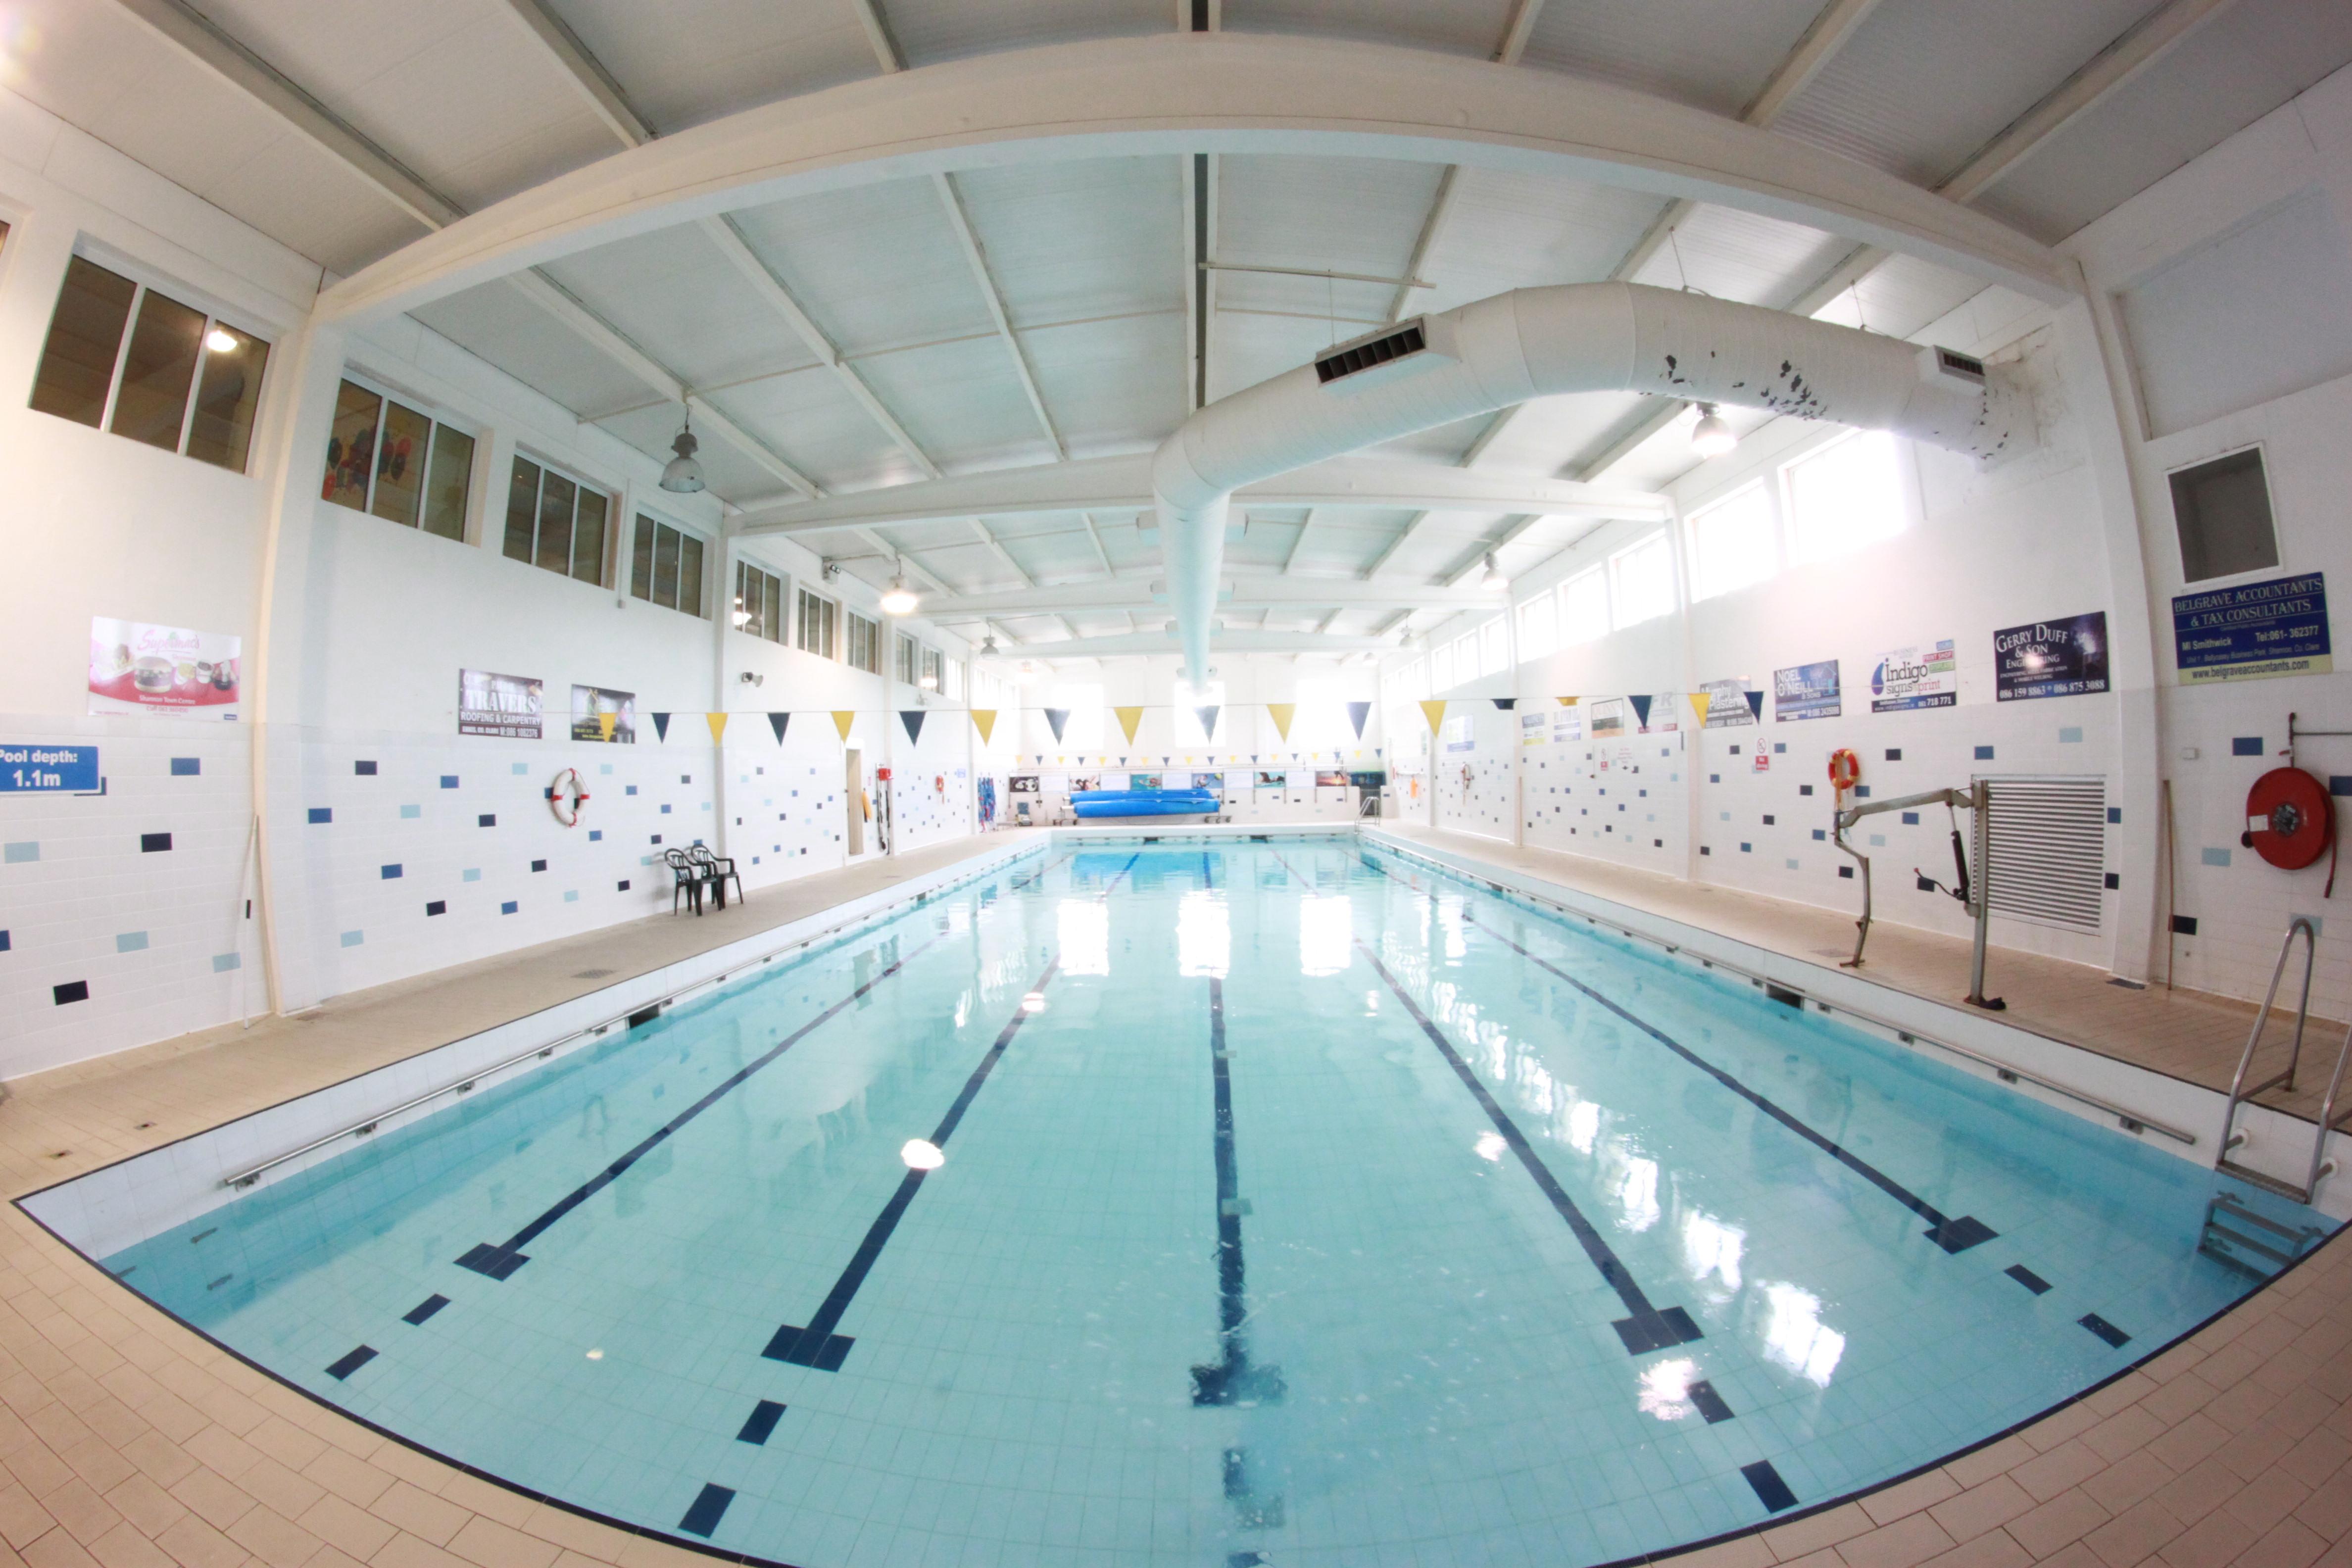 Facilities gym pool astro turf shannon leisure - University of alberta swimming pool ...